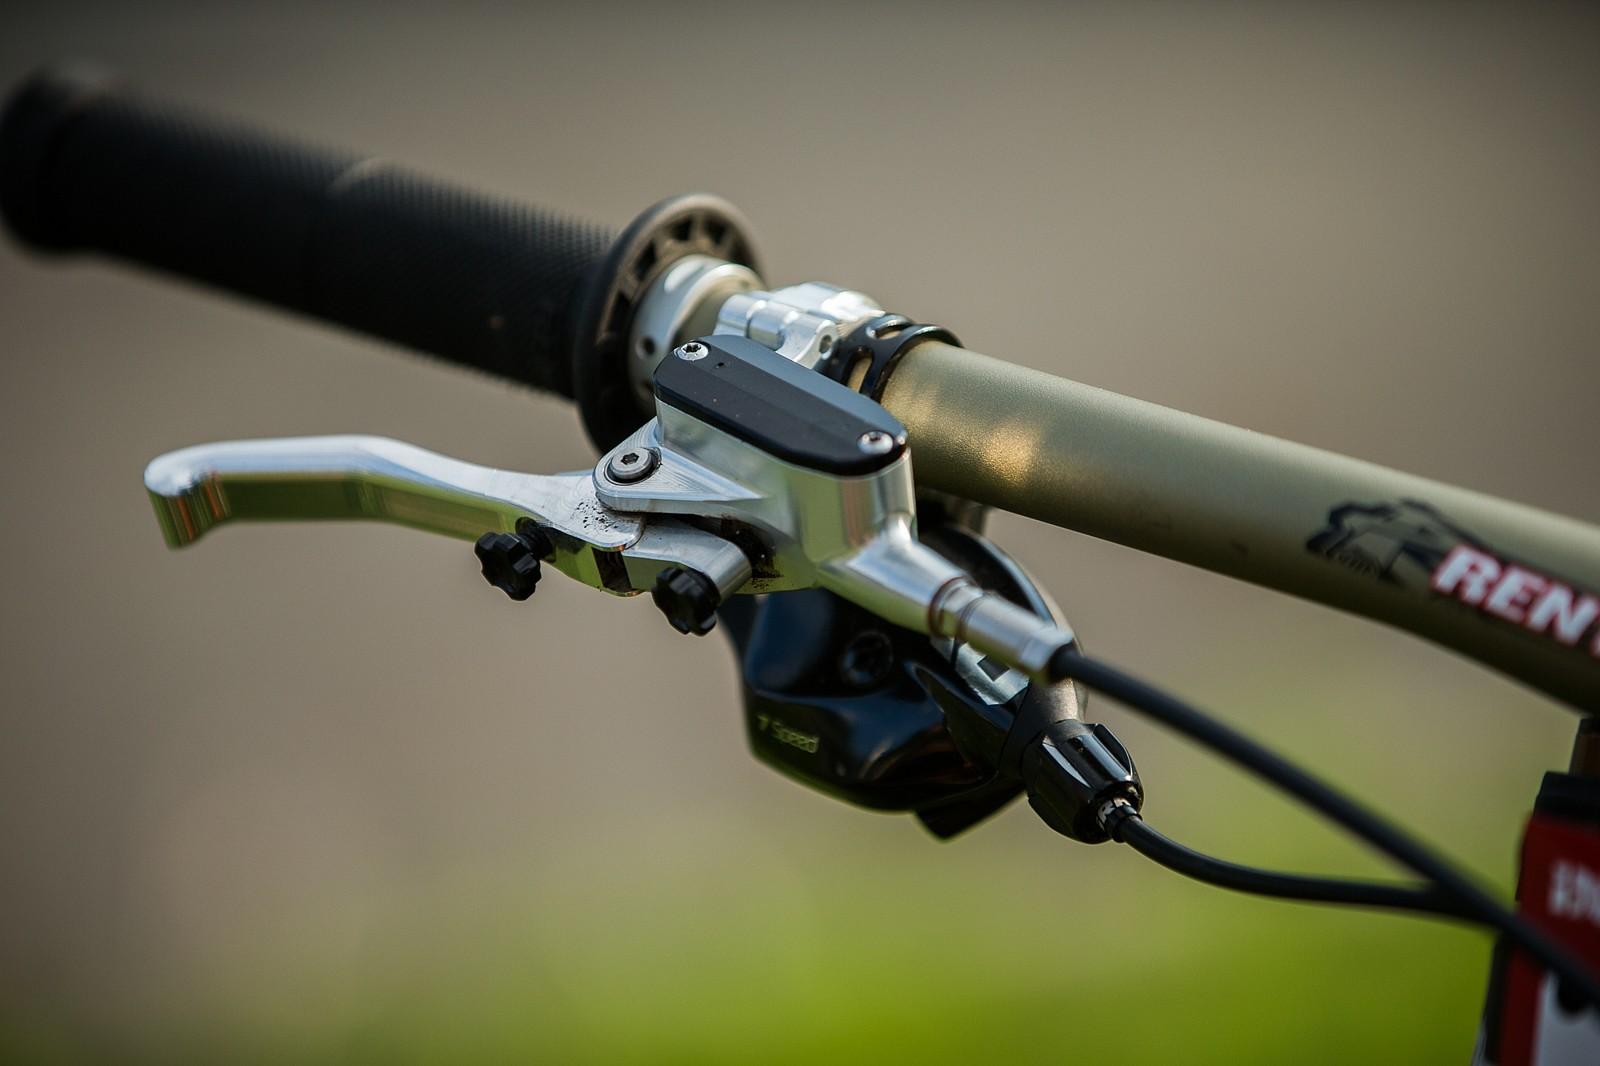 Prototype Hope V4 Brake Levers - Adam Brayton's Nukeproof Dissent with Prototype Hope Brakes - Mountain Biking Pictures - Vital MTB